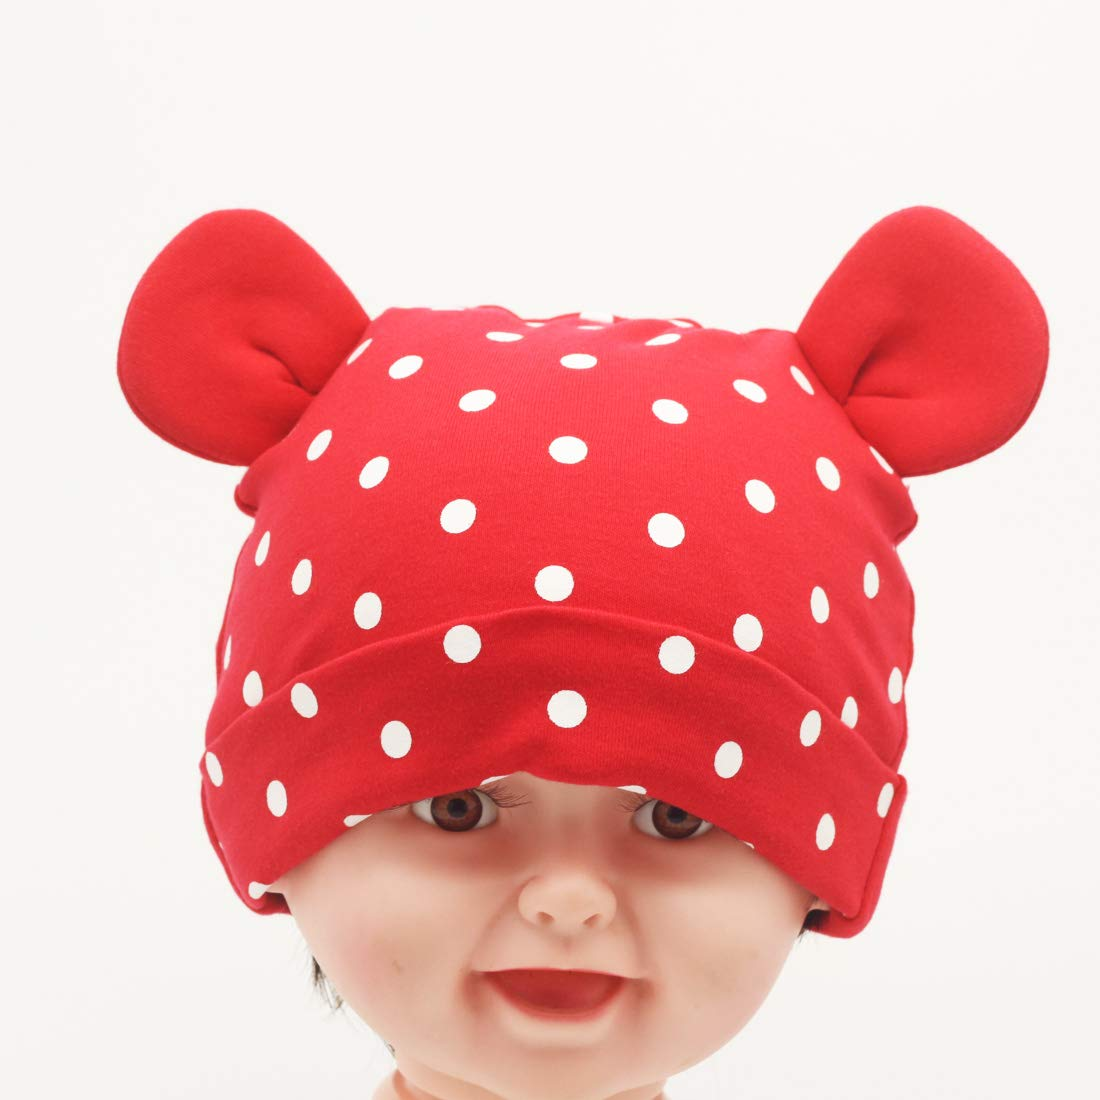 Nihao Baby Hat Ears Toddler Infant Girls Boys Cat Bear Ear Hat Beanie Cap Baby Boys Hats & Caps